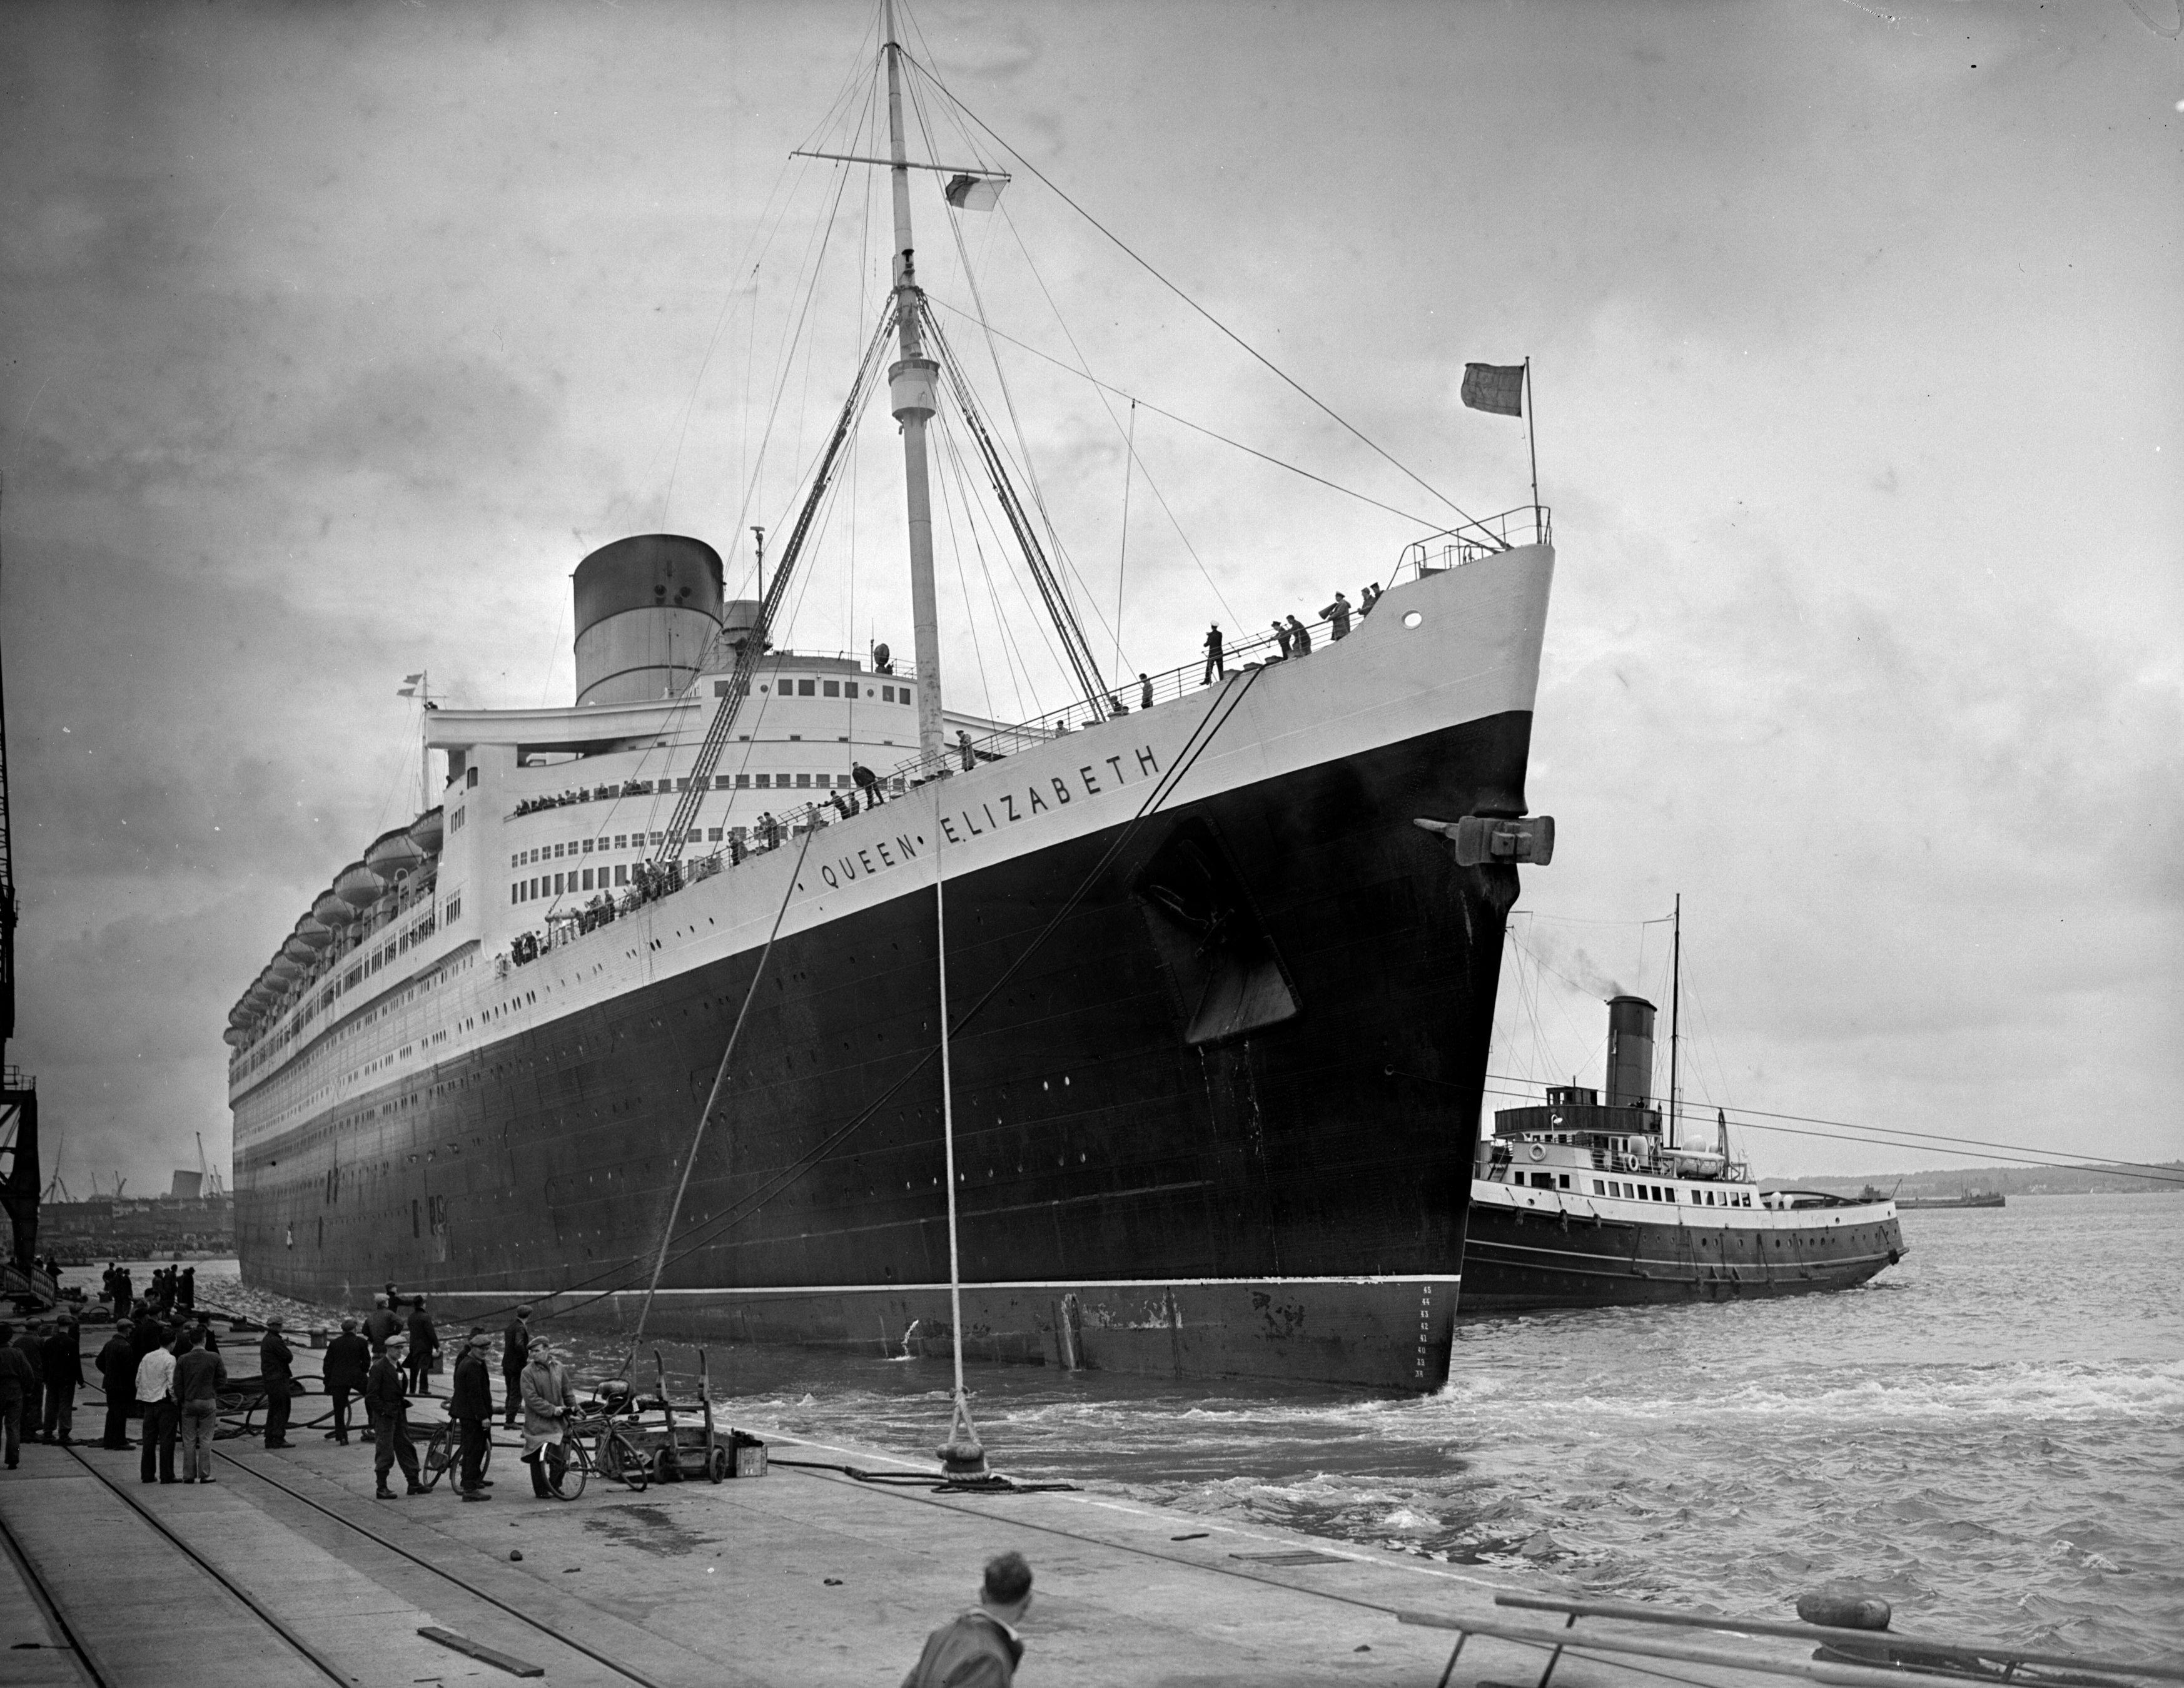 Queen Elizabeth II luxury liner ship docked at south hampton